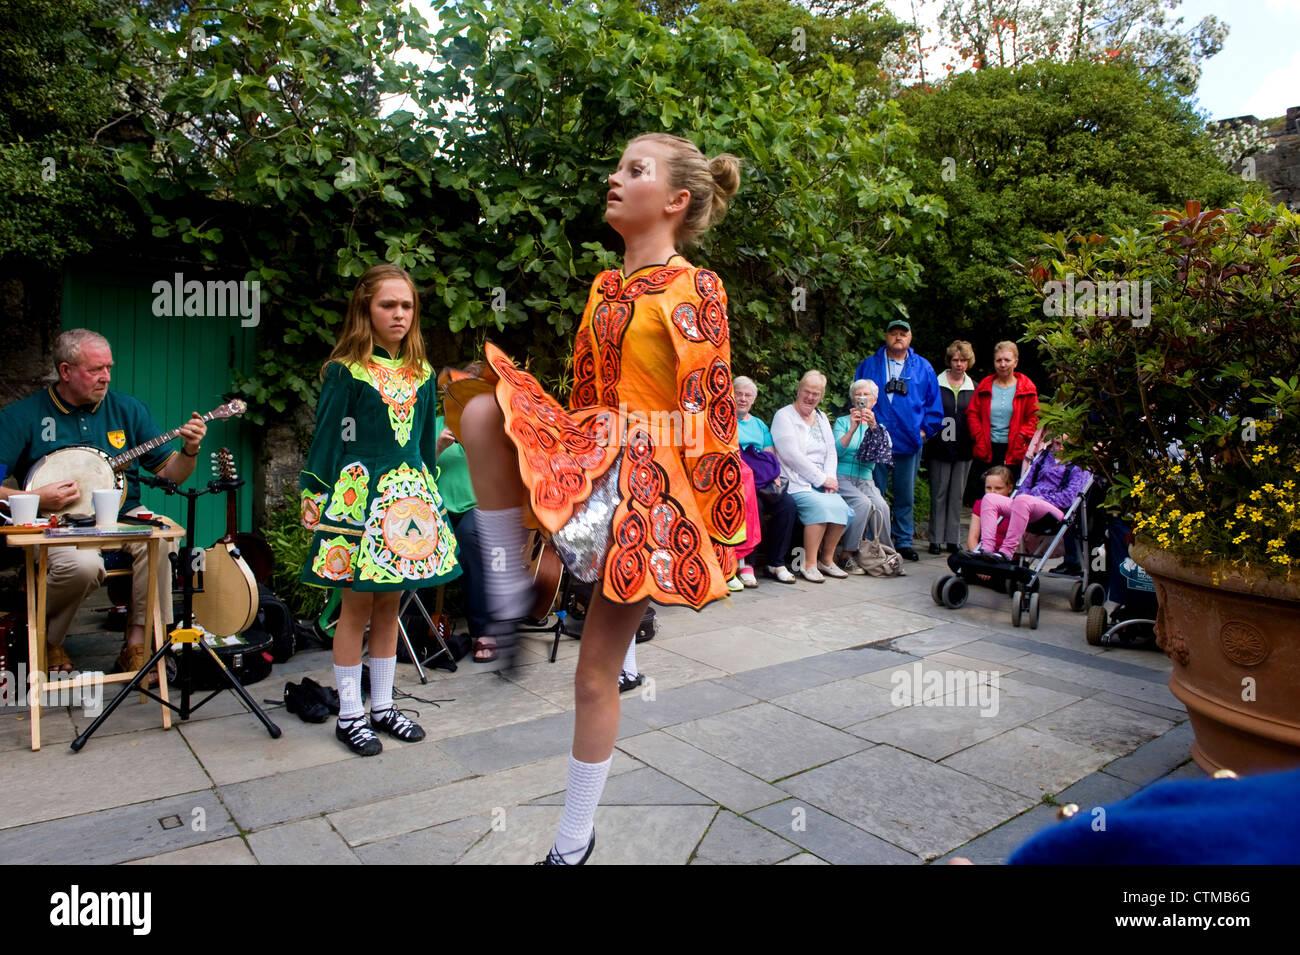 Irish dancing at Glenveagh, Donegal, Ireland - Stock Image